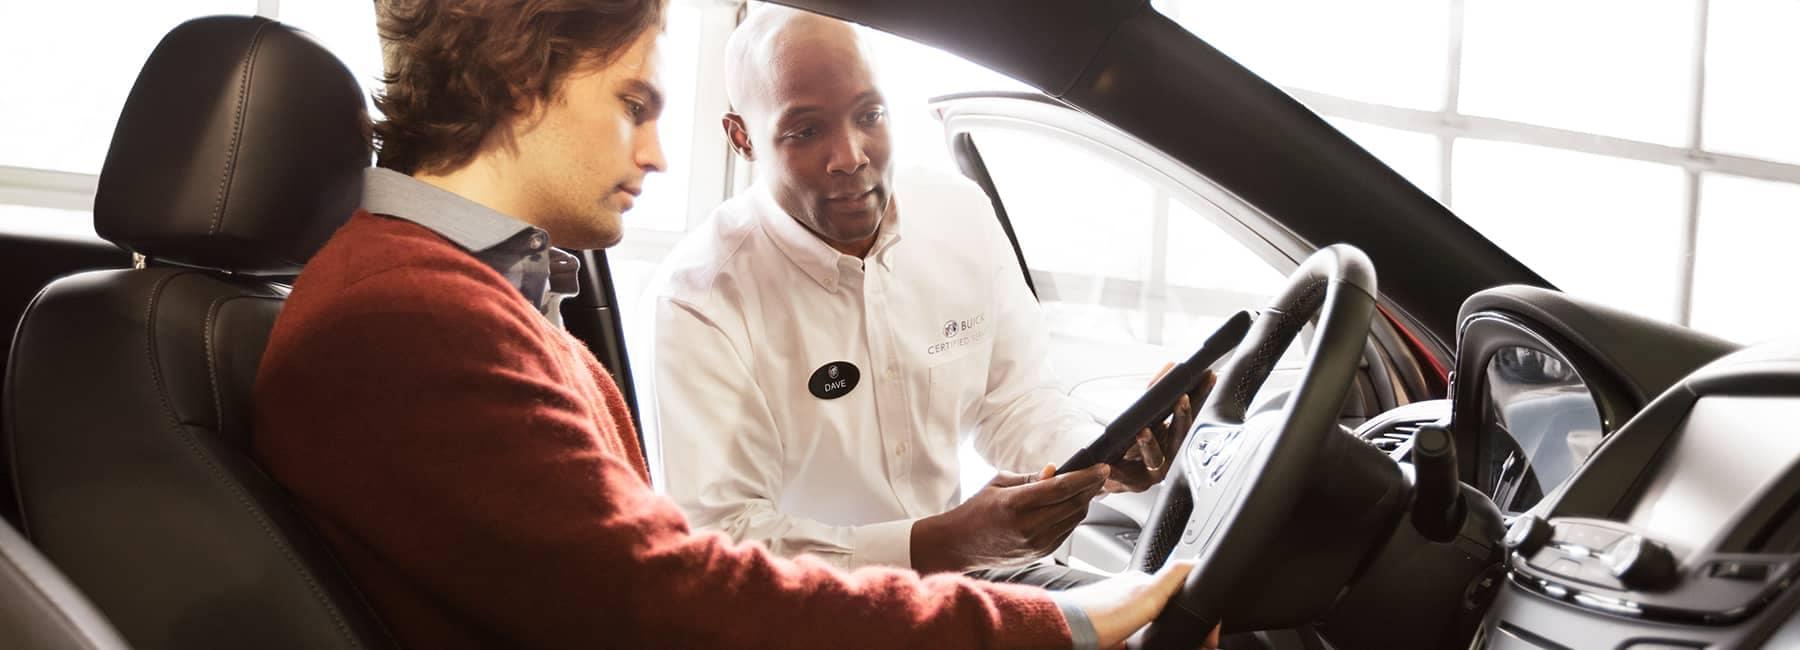 Buick Service & Parts